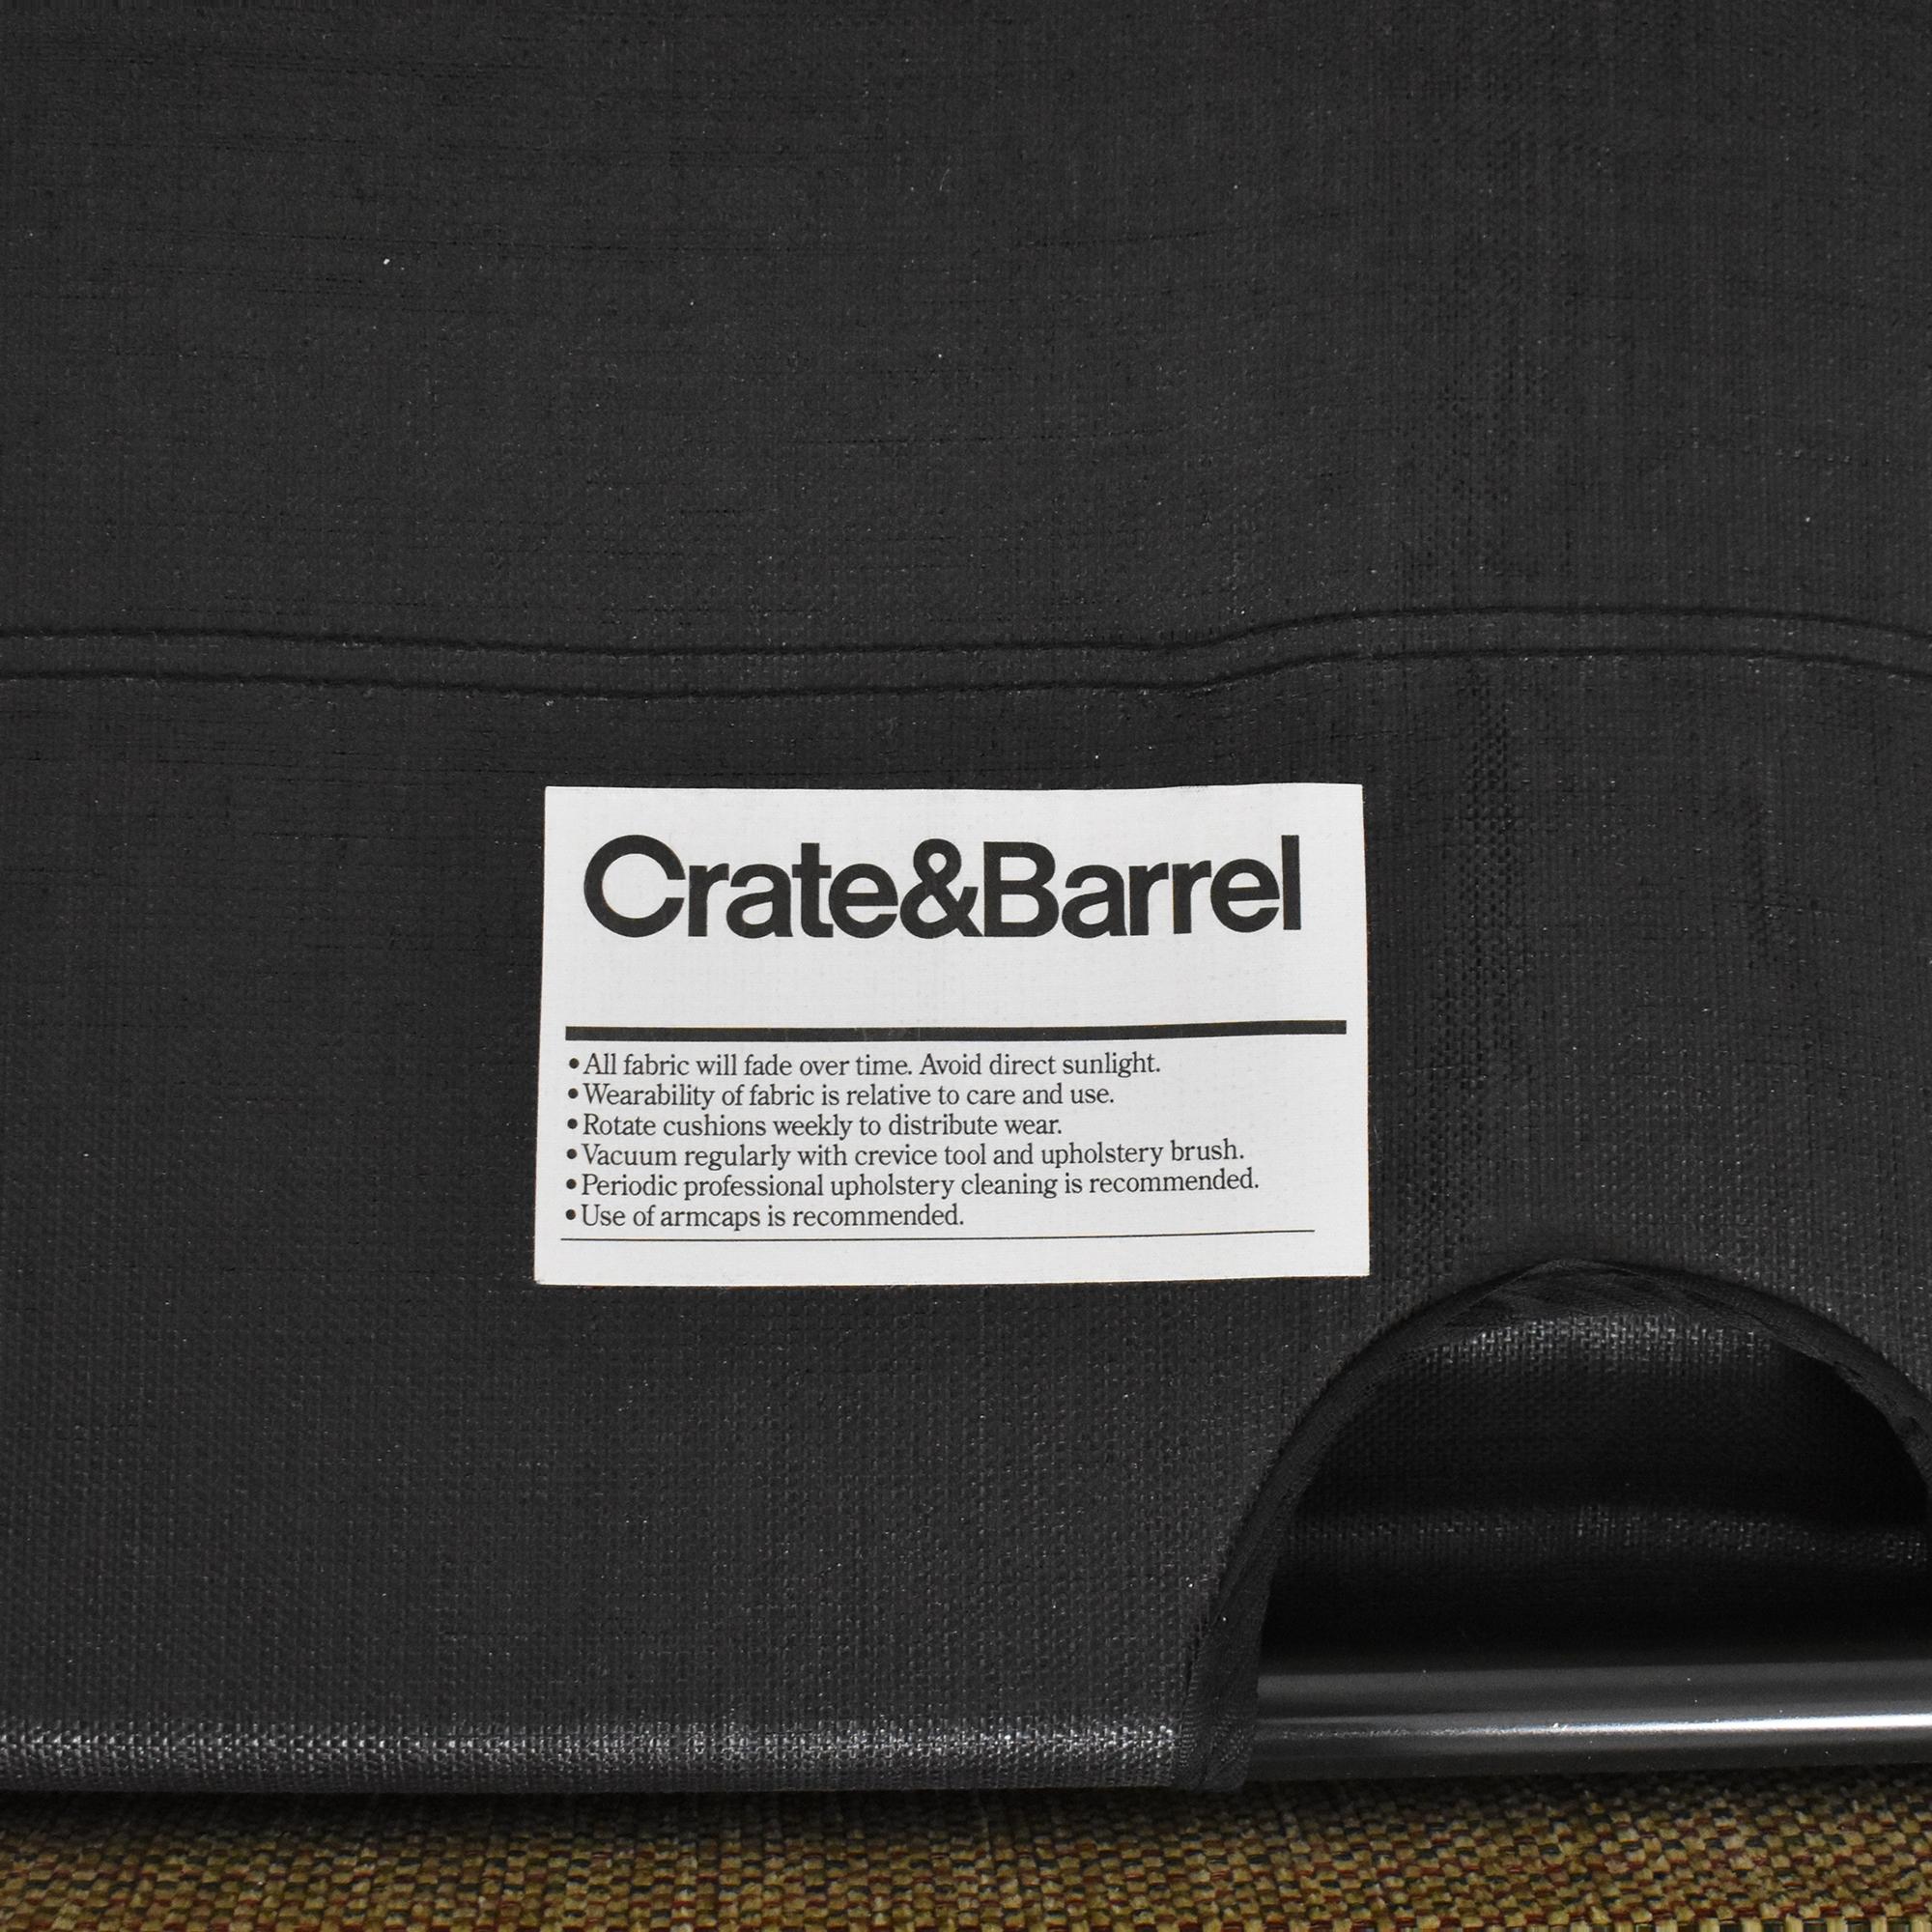 Crate & Barrel Crate & Barrel Three Cushion Sleeper Sofa dimensions